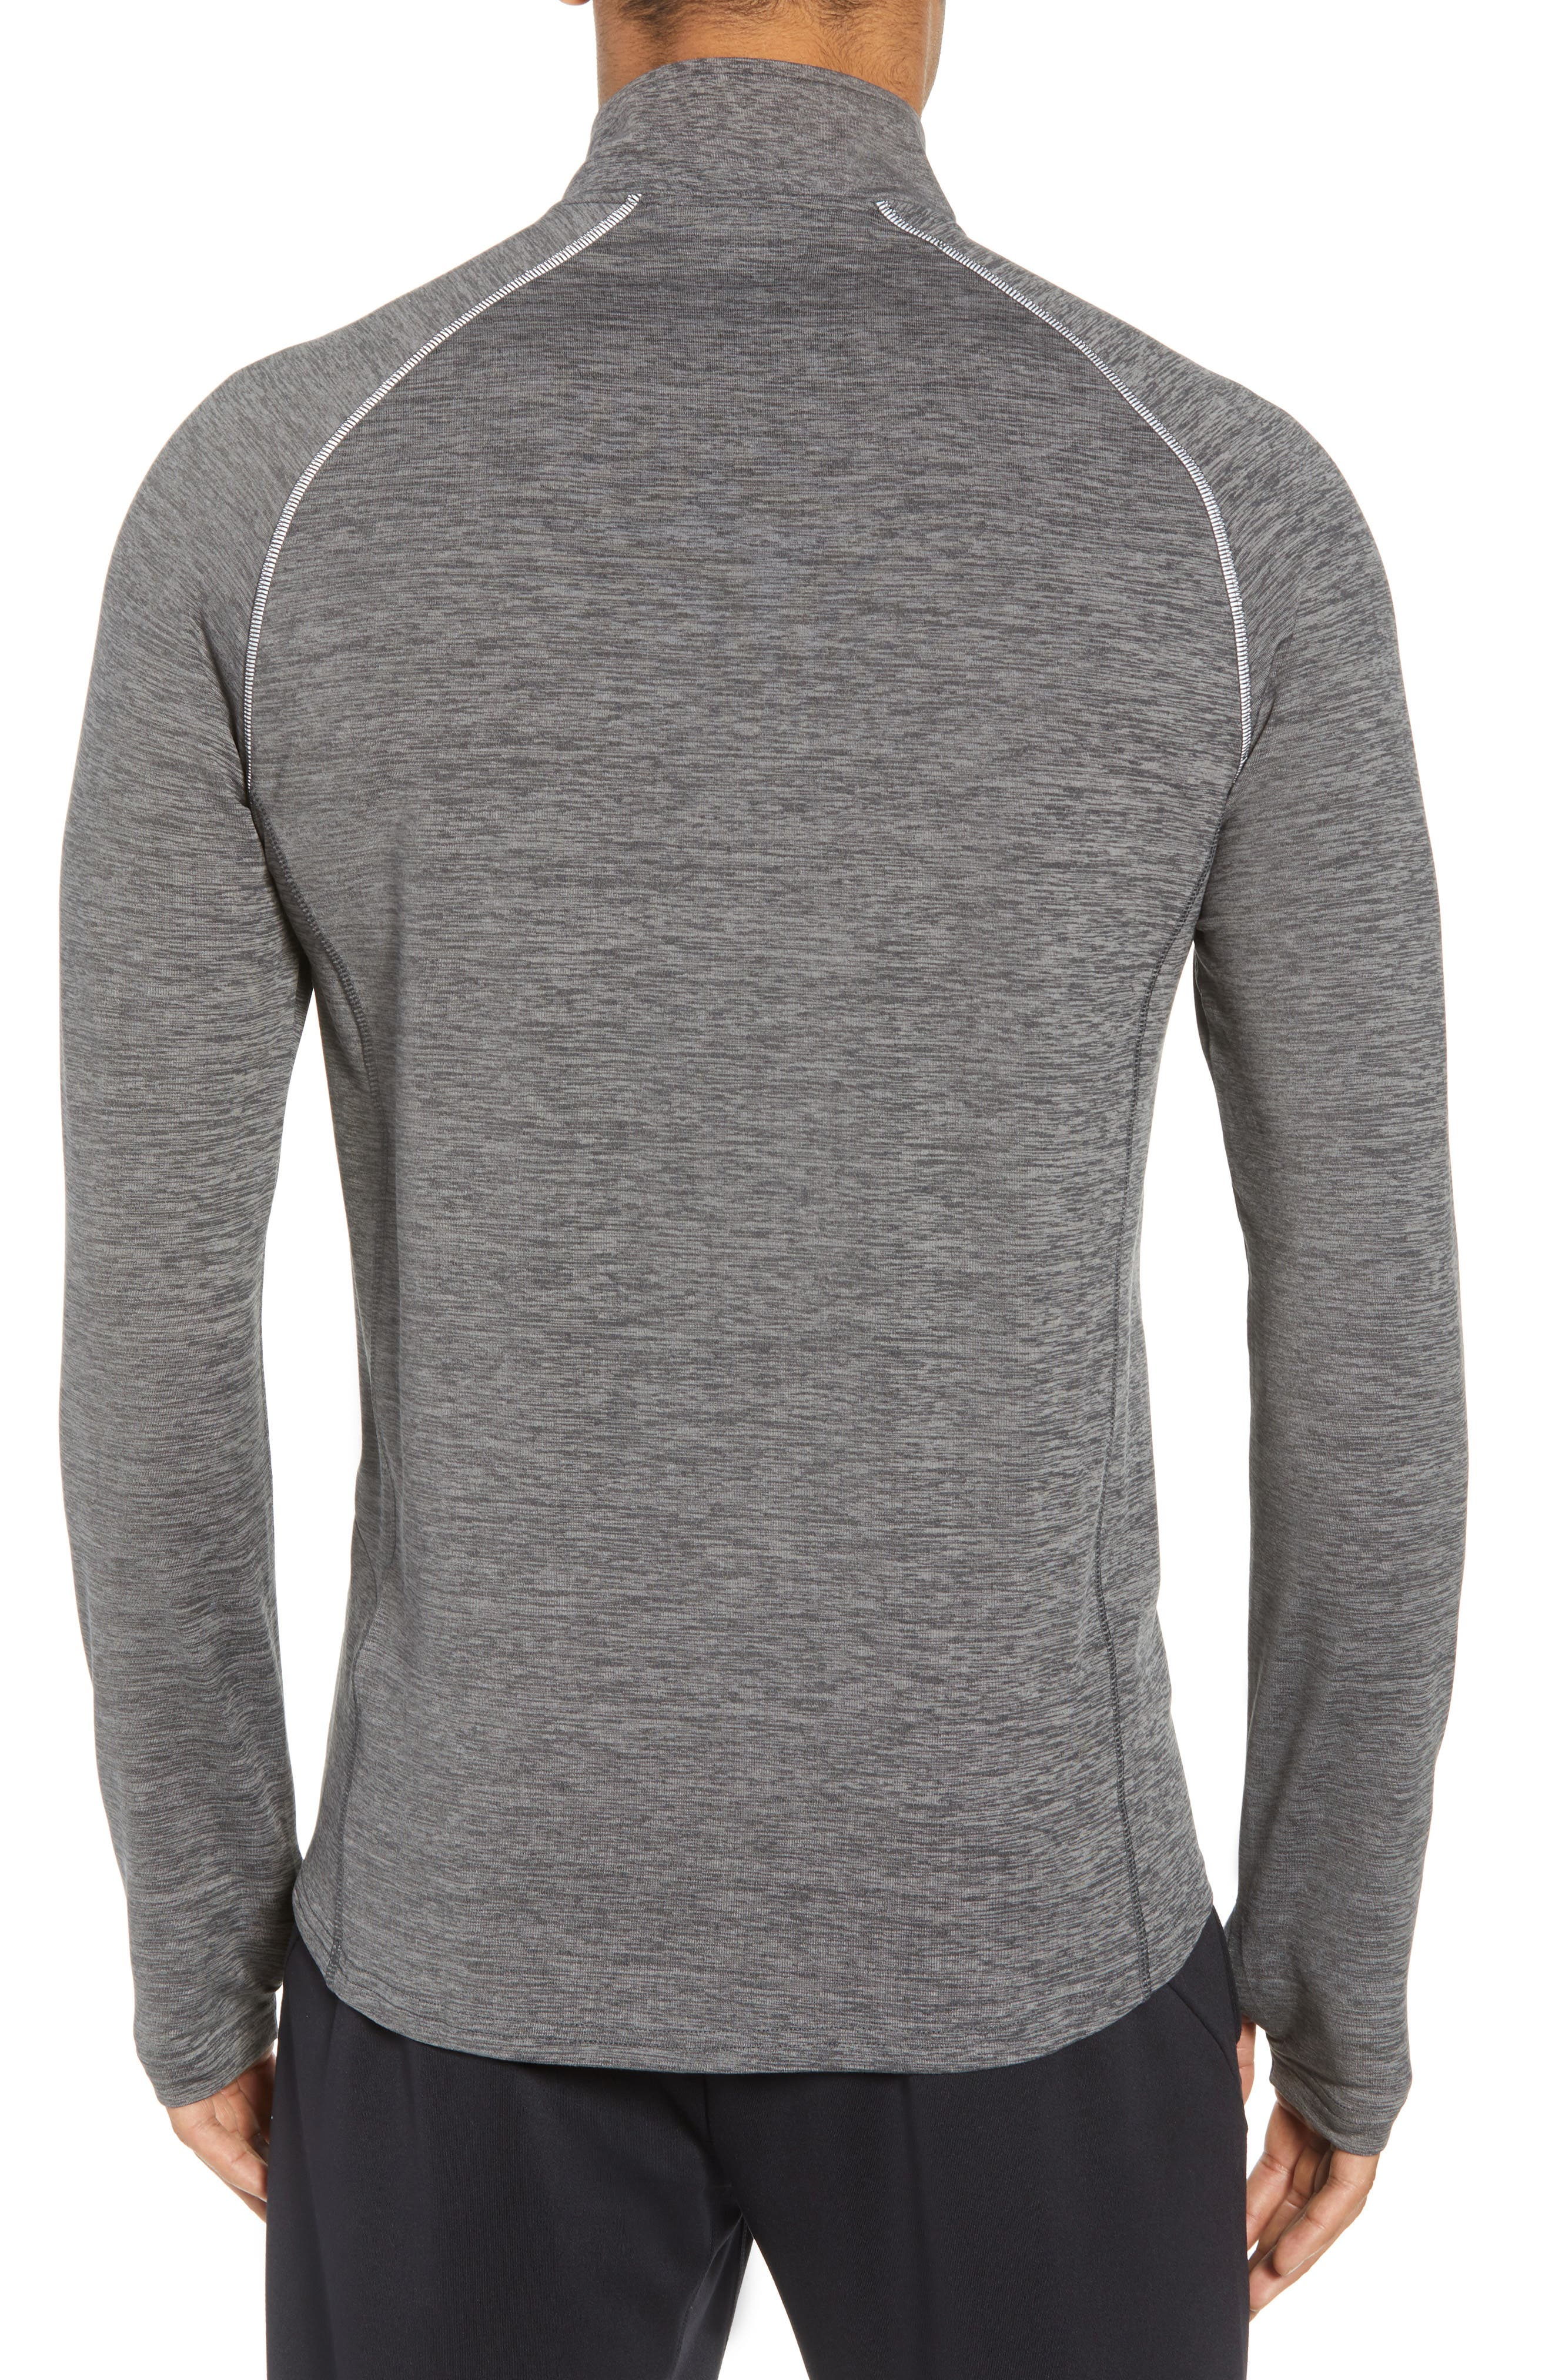 Core Half Zip Sweatshirt,                             Alternate thumbnail 2, color,                             Black Pepper Spacedye